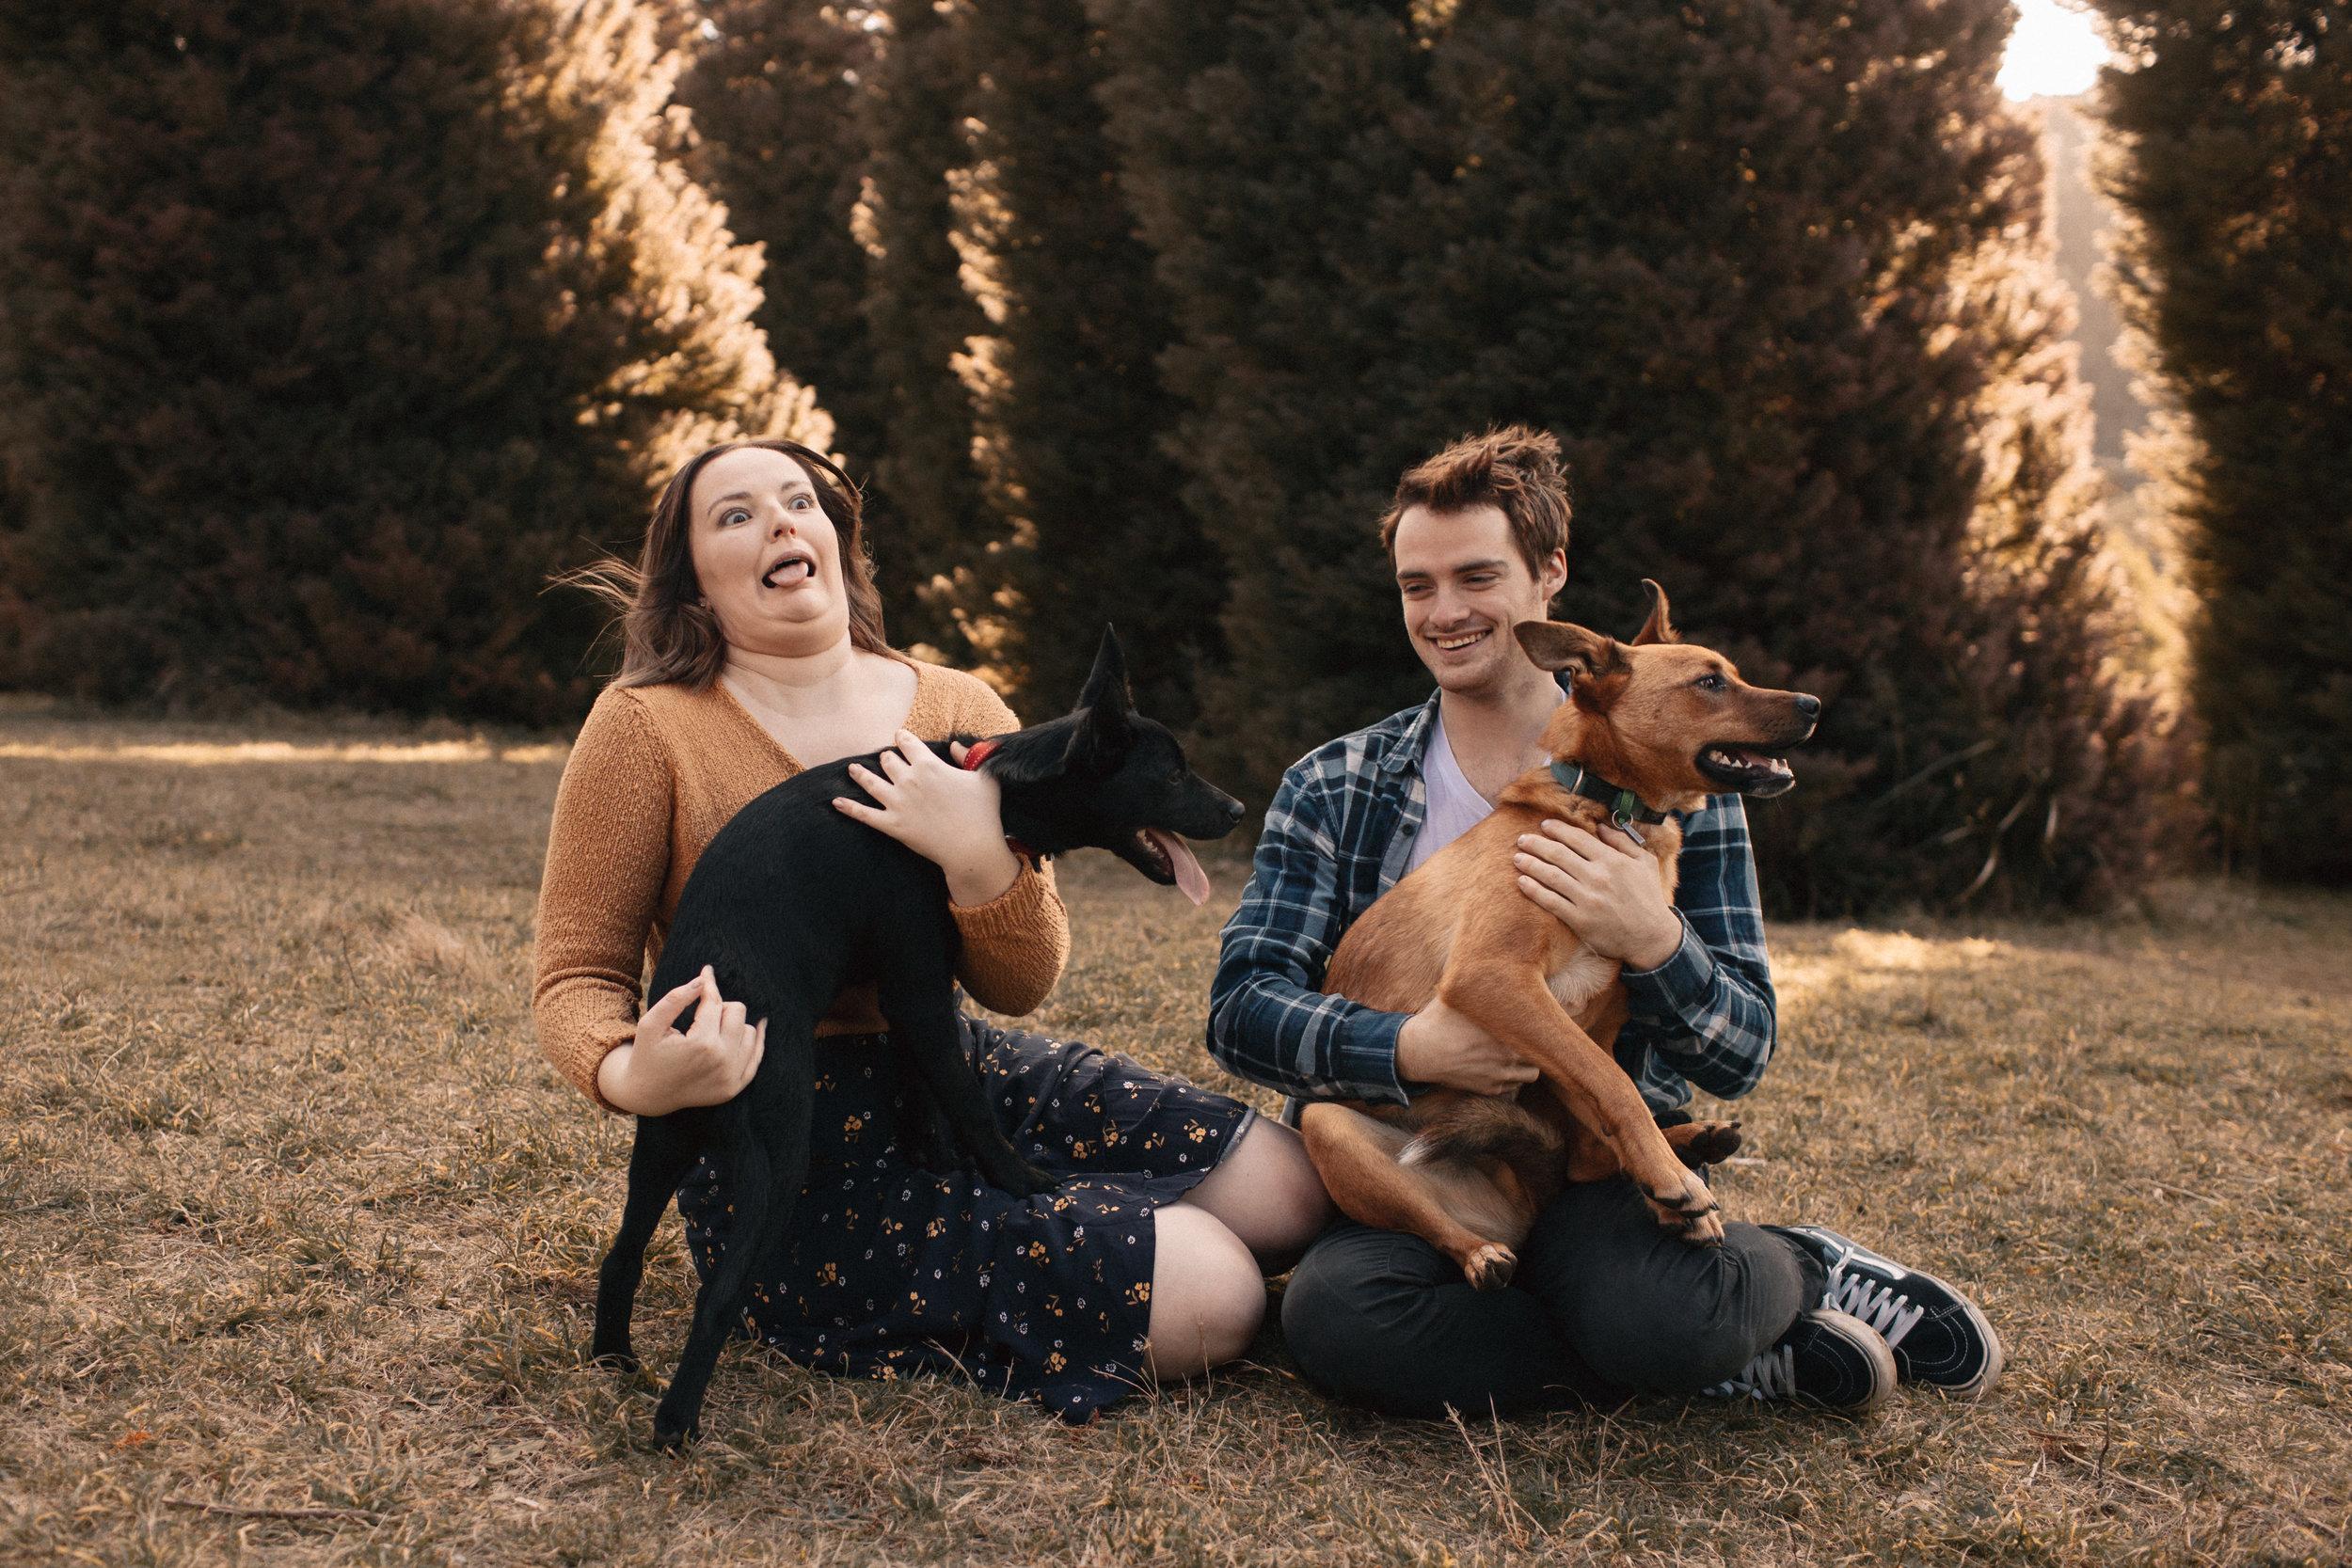 Ashleigh Haase Yarra Valley based Wedding Photographer - Dandenong Ranges